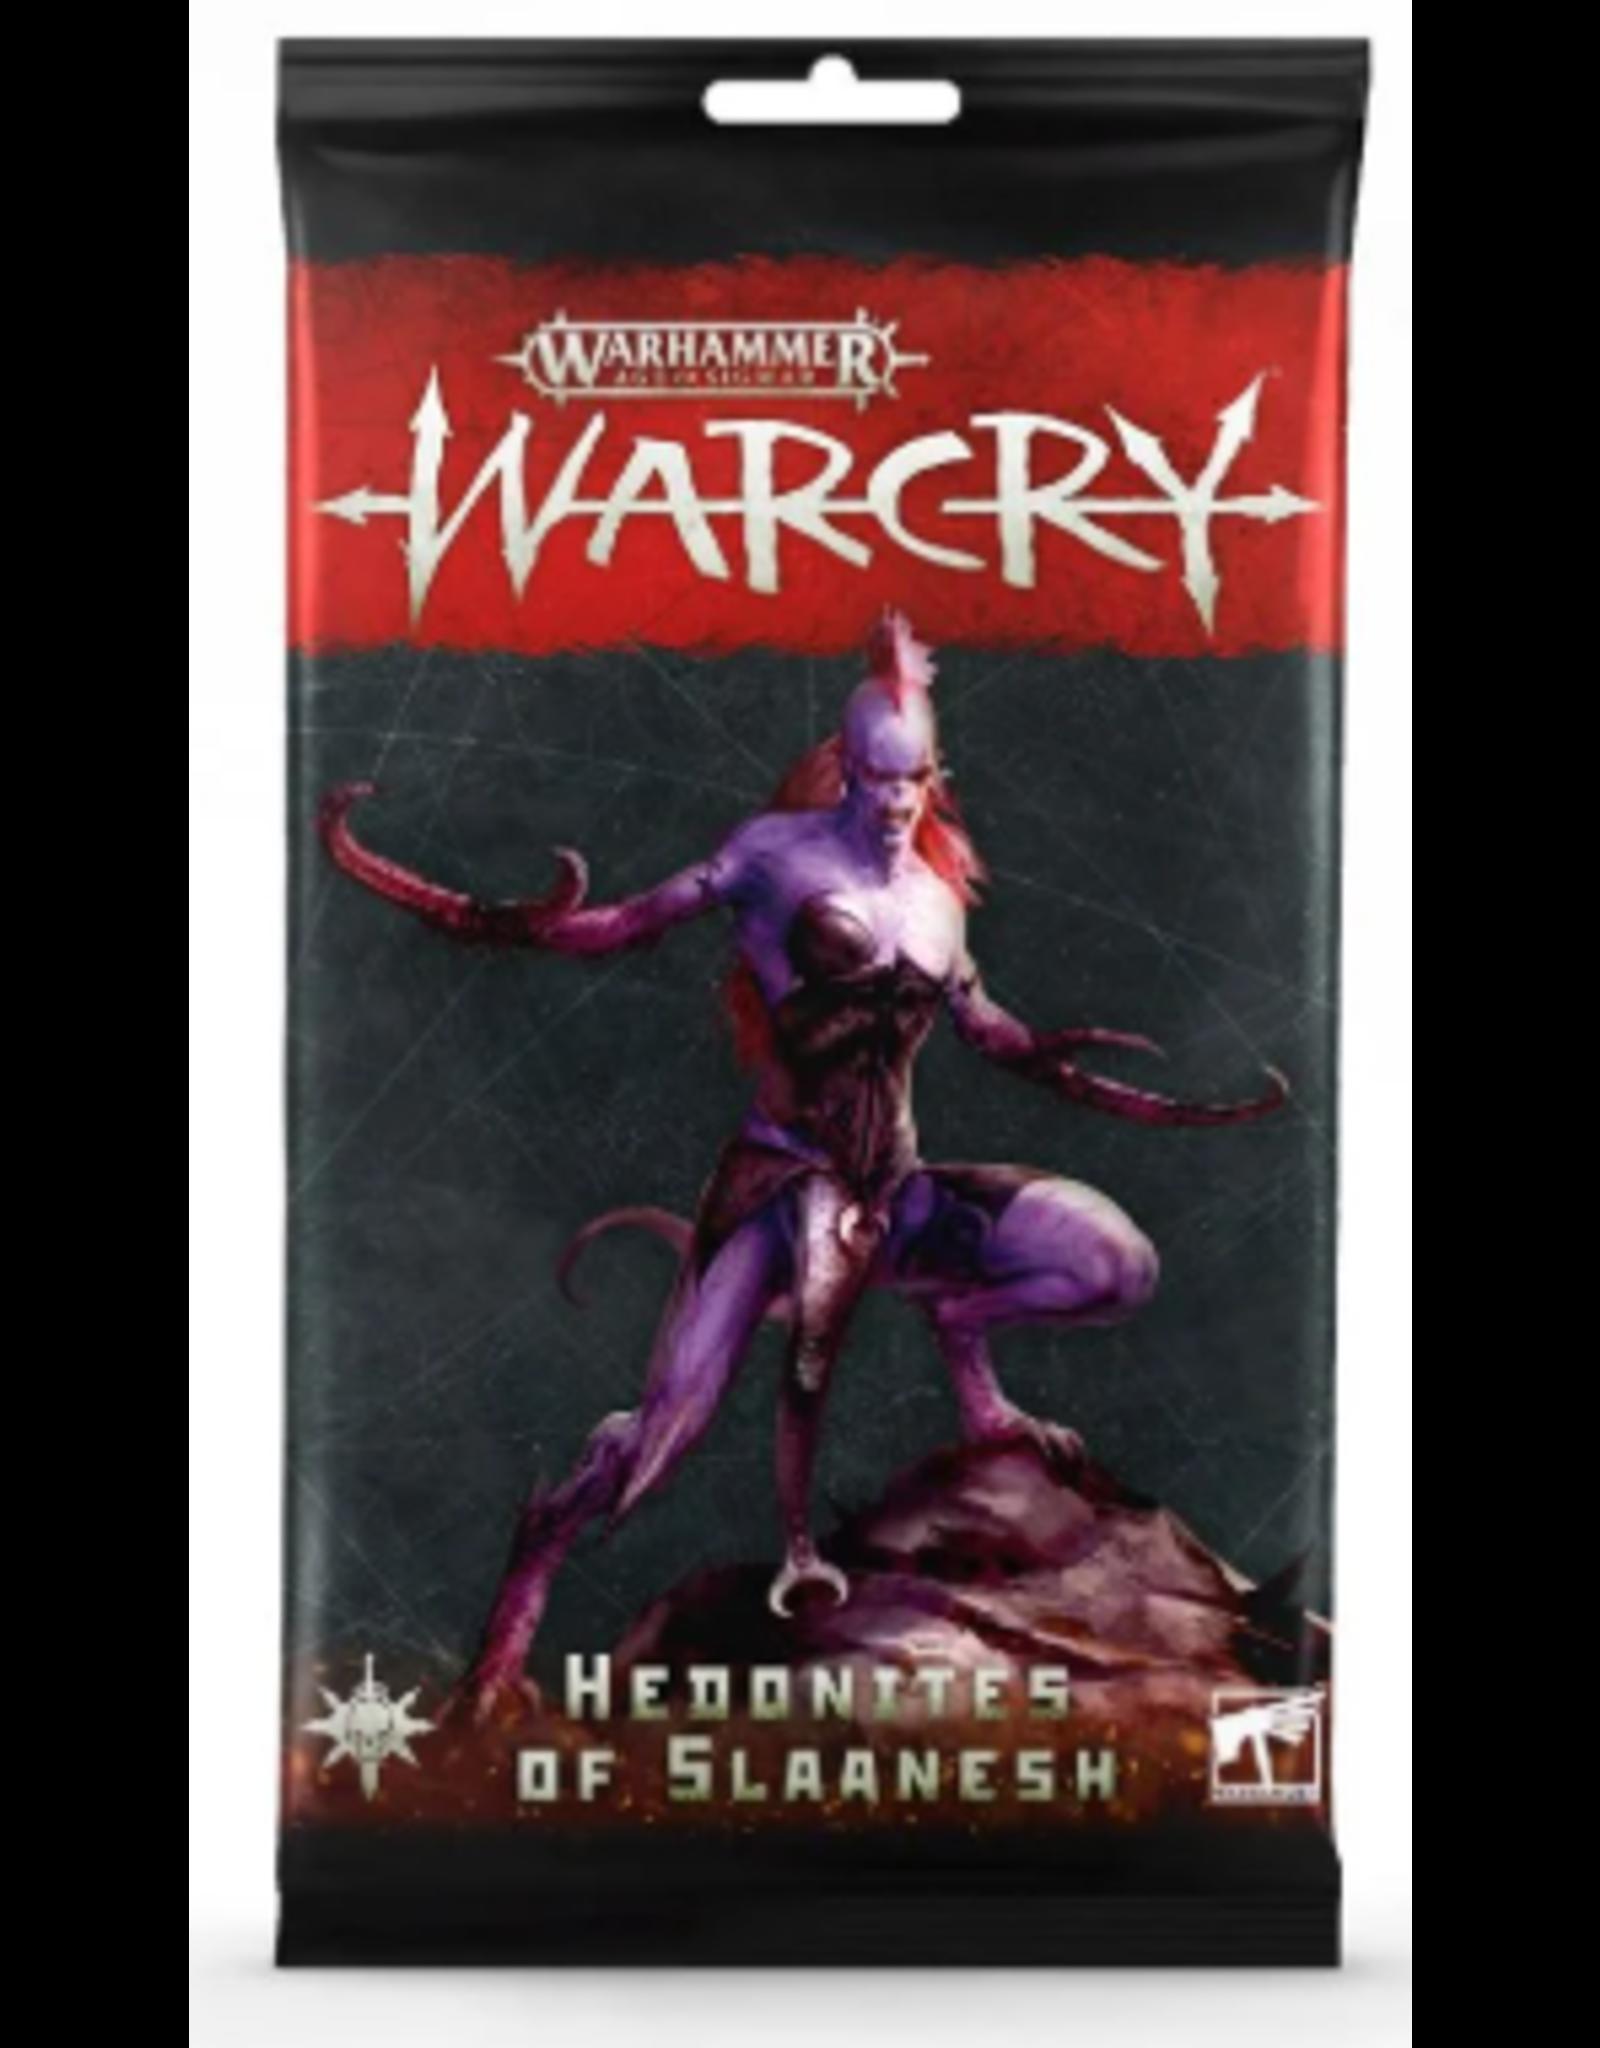 Games Workshop Warhammer Age of Sigmar: Warcry Hedonites of Slaanesh Card Pack